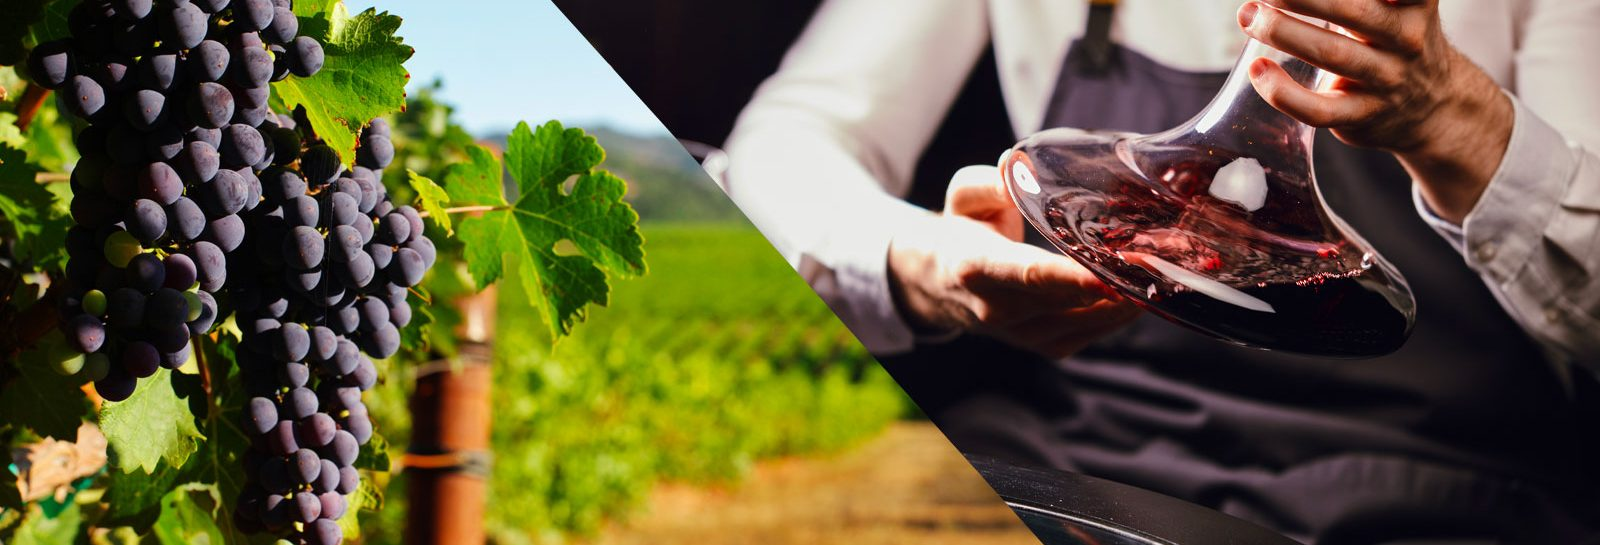 agri team viticulteur